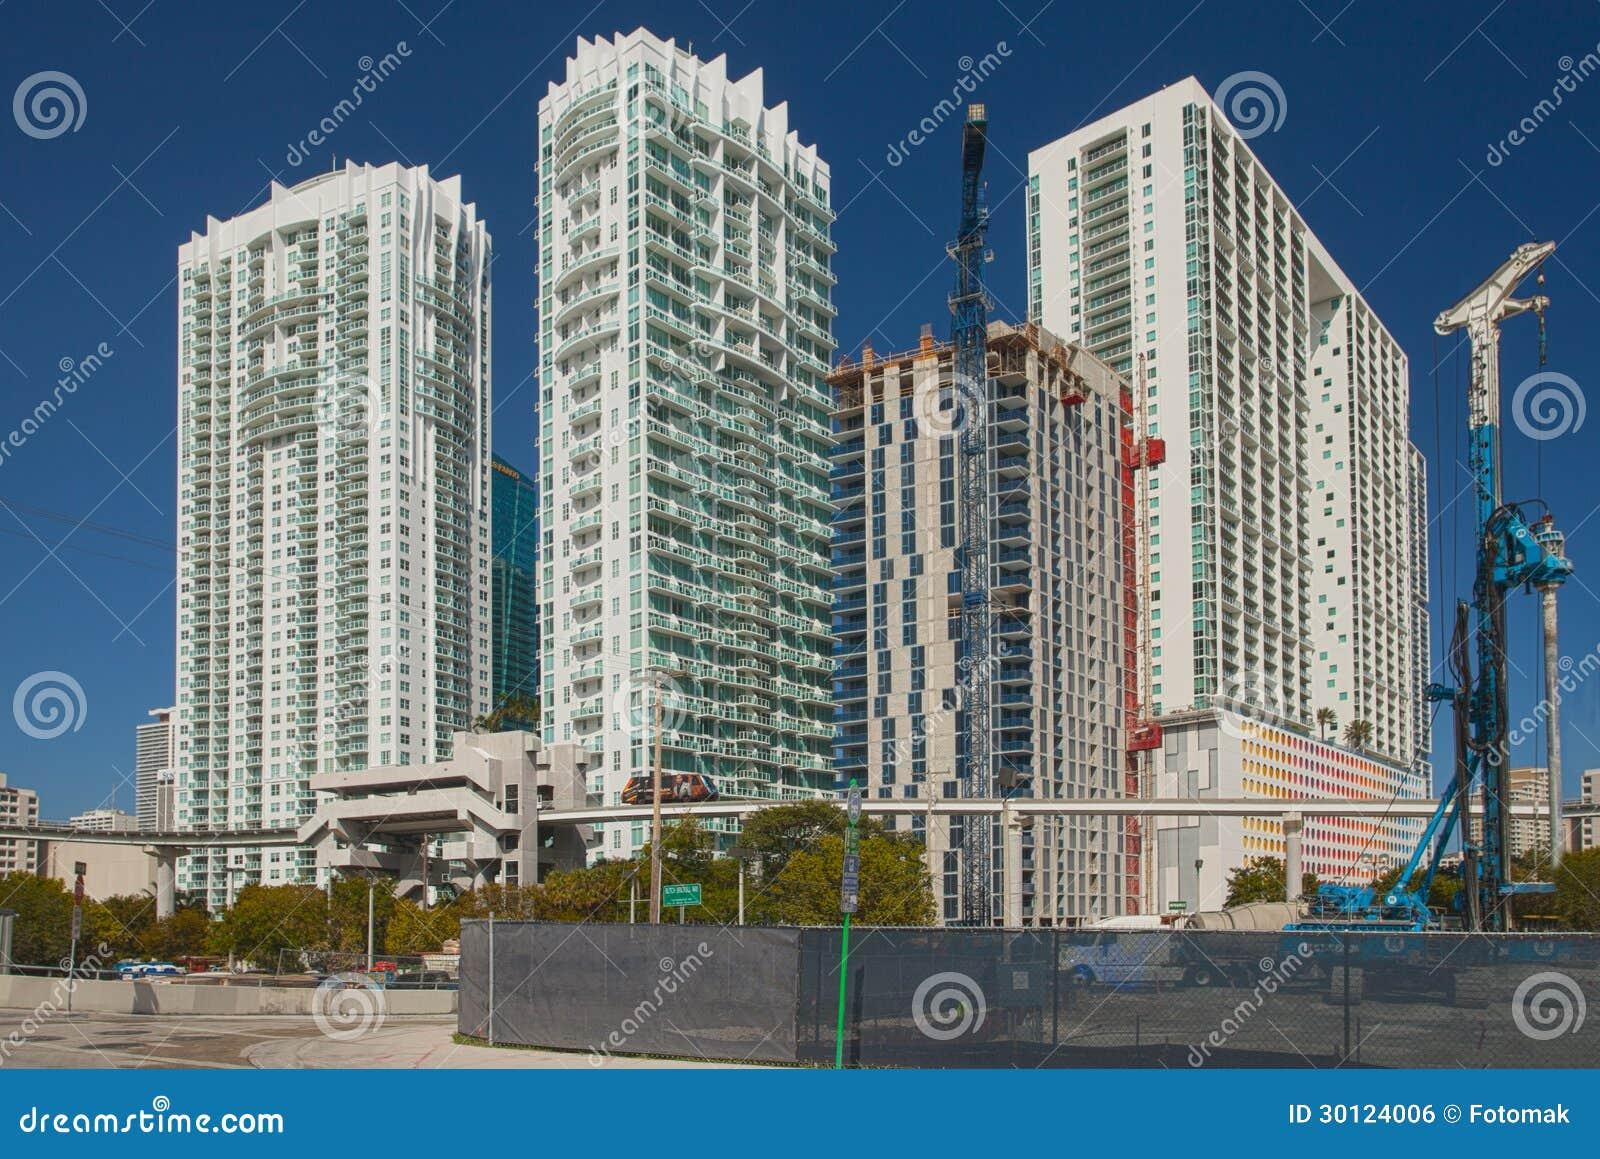 city of miami florida construction editorial photo